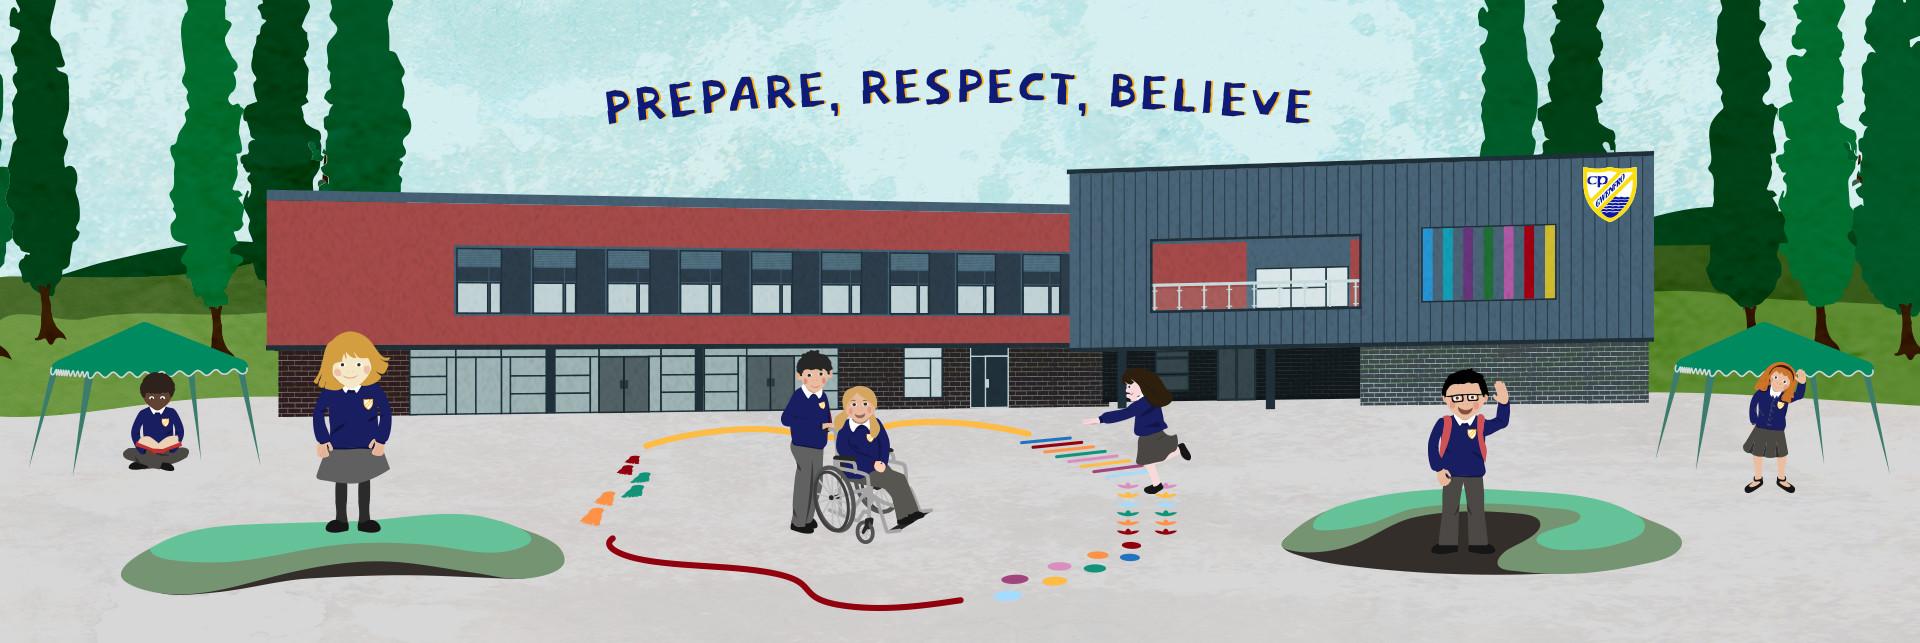 Gwenfro Community Primary School